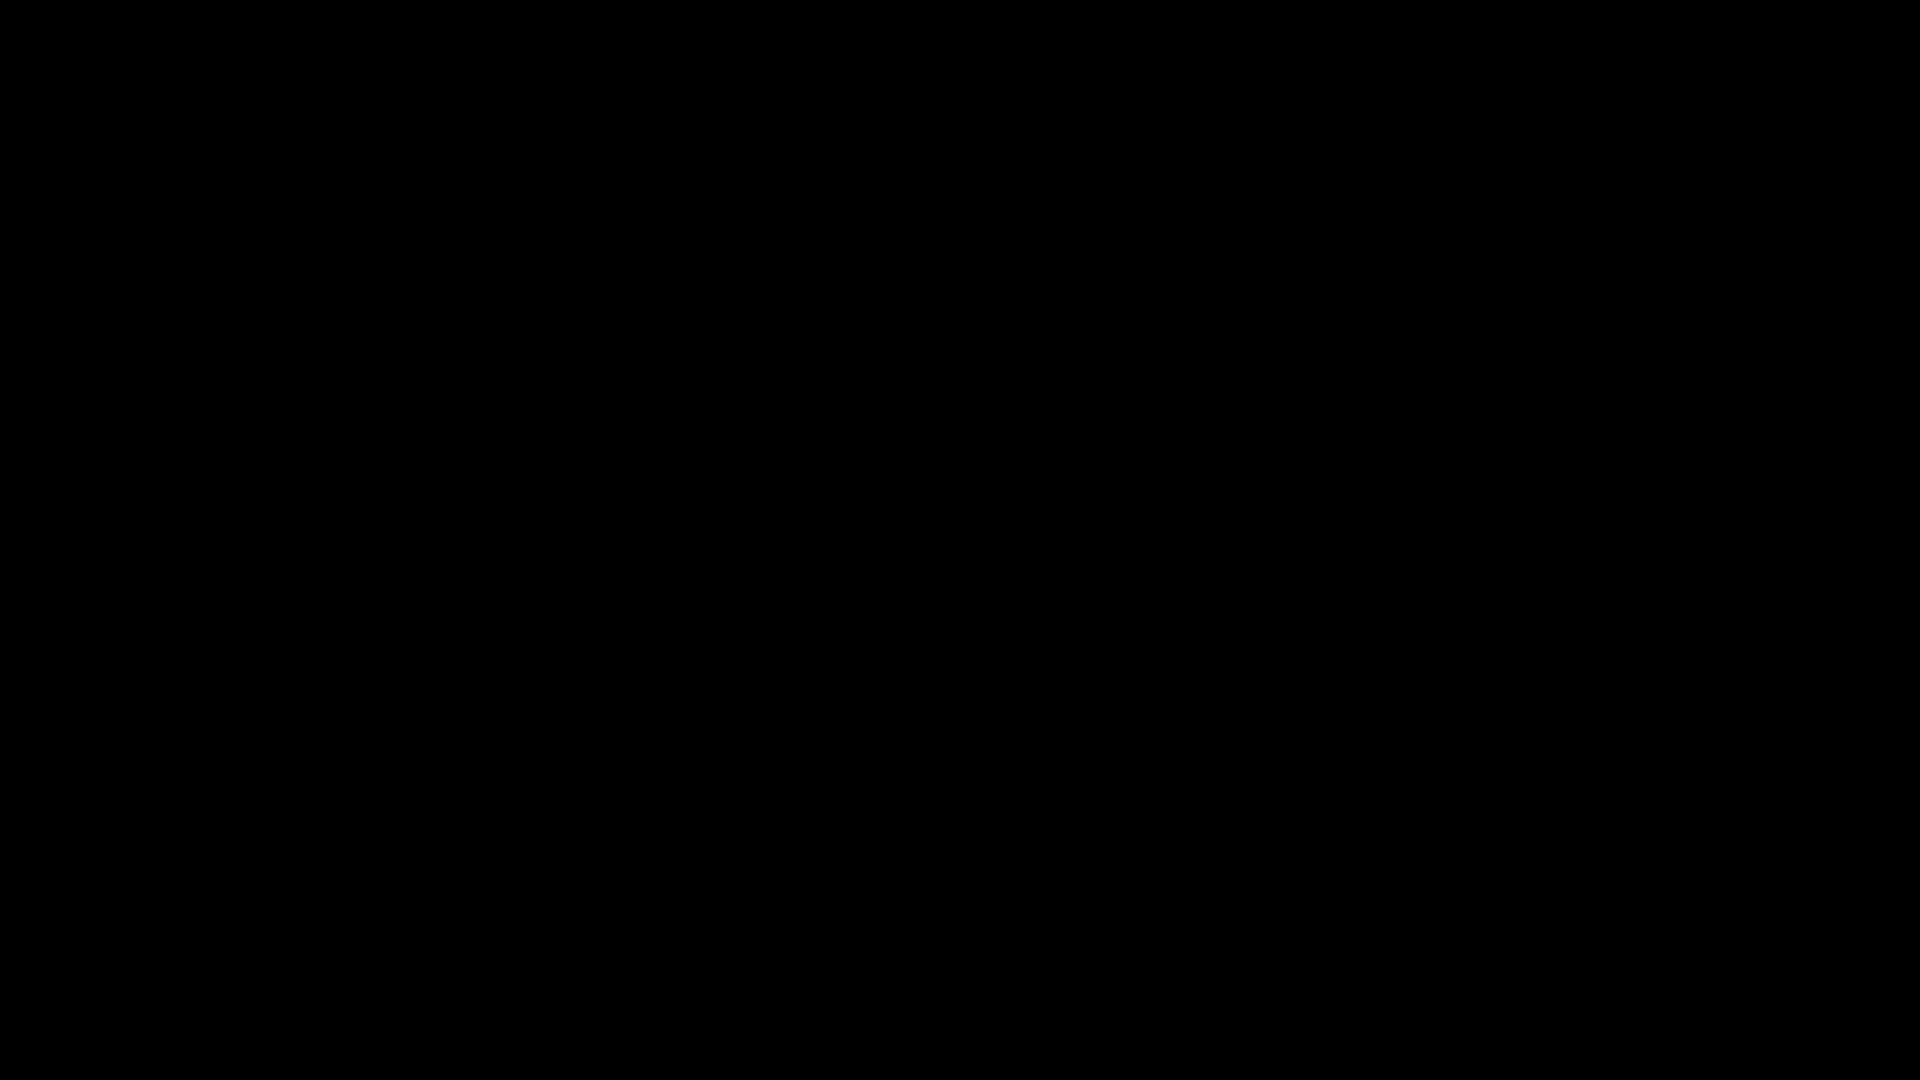 高画質露天女風呂観察 vol.032 露天 盗み撮り動画 103pic 21